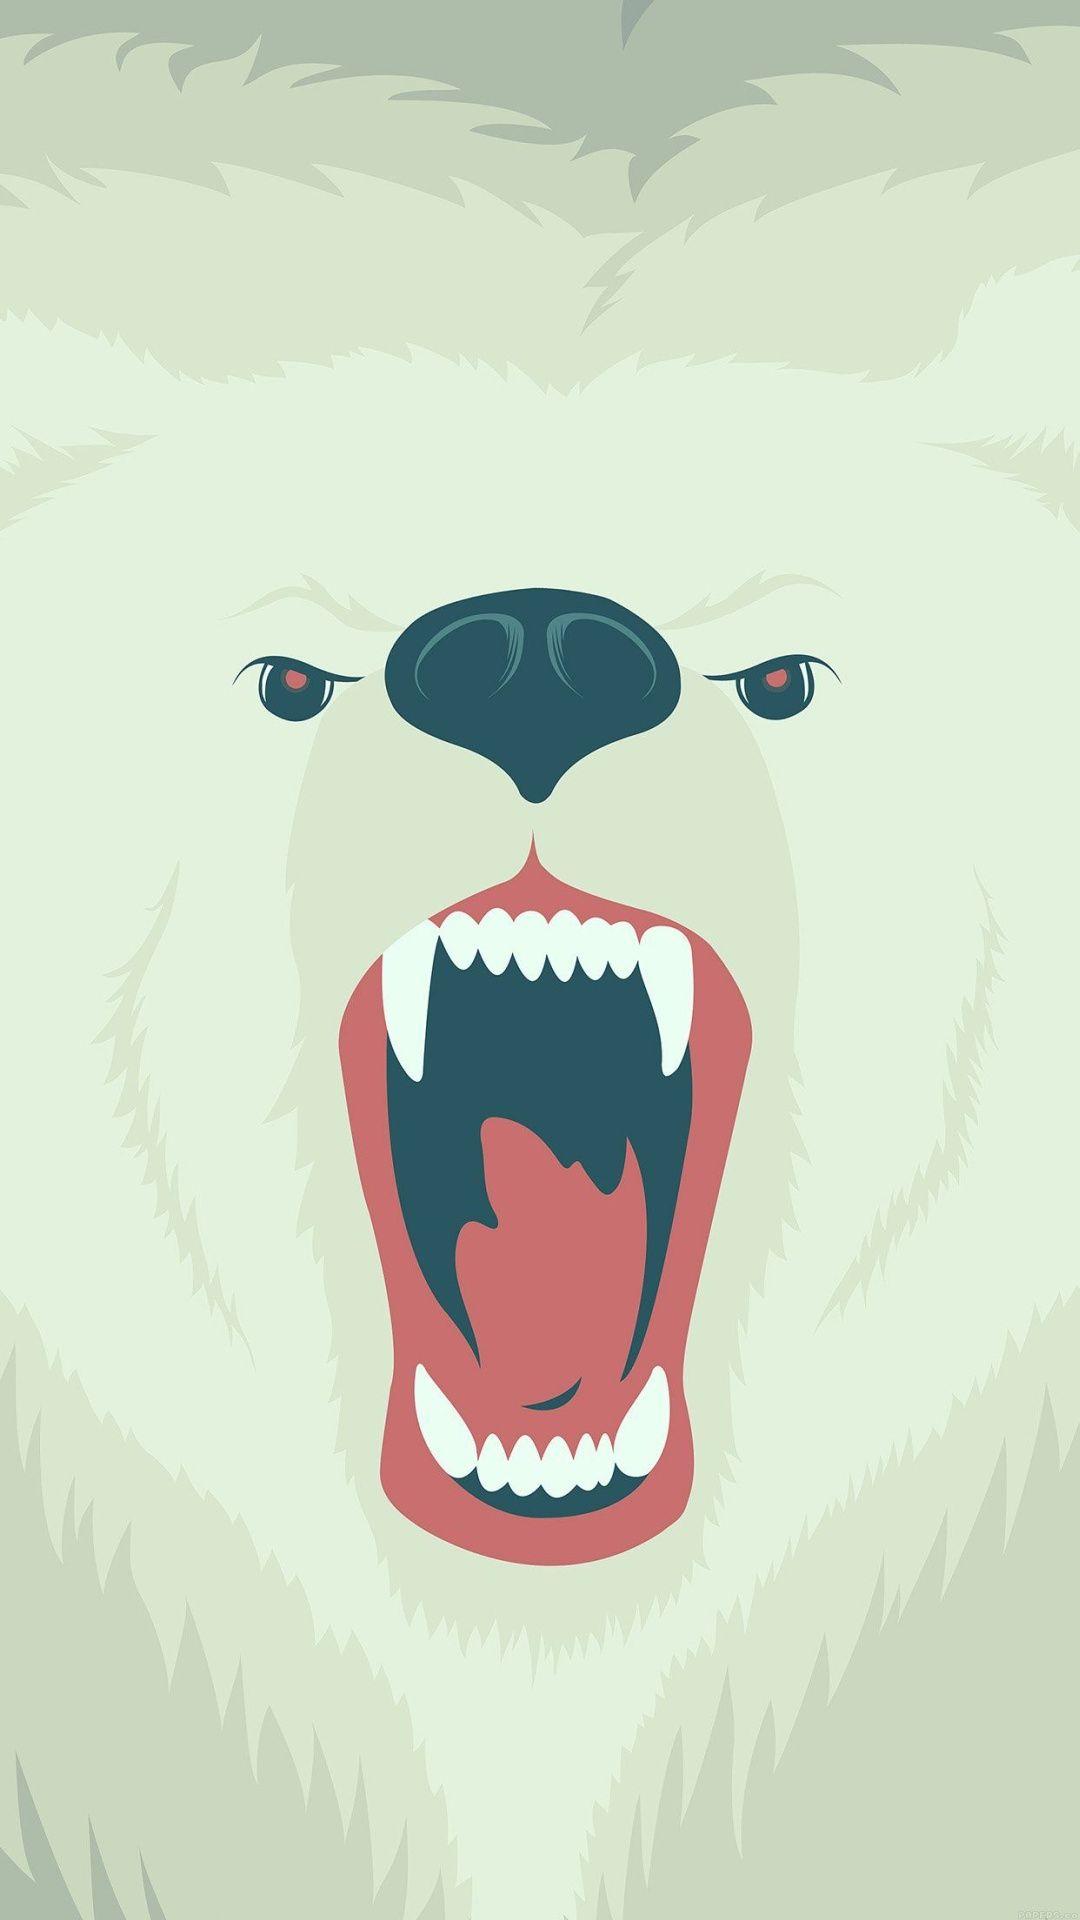 Animal iphone wallpaper tumblr - Fierce Polar Bear Winter Iphone 6 Plus Hd Wallpaper